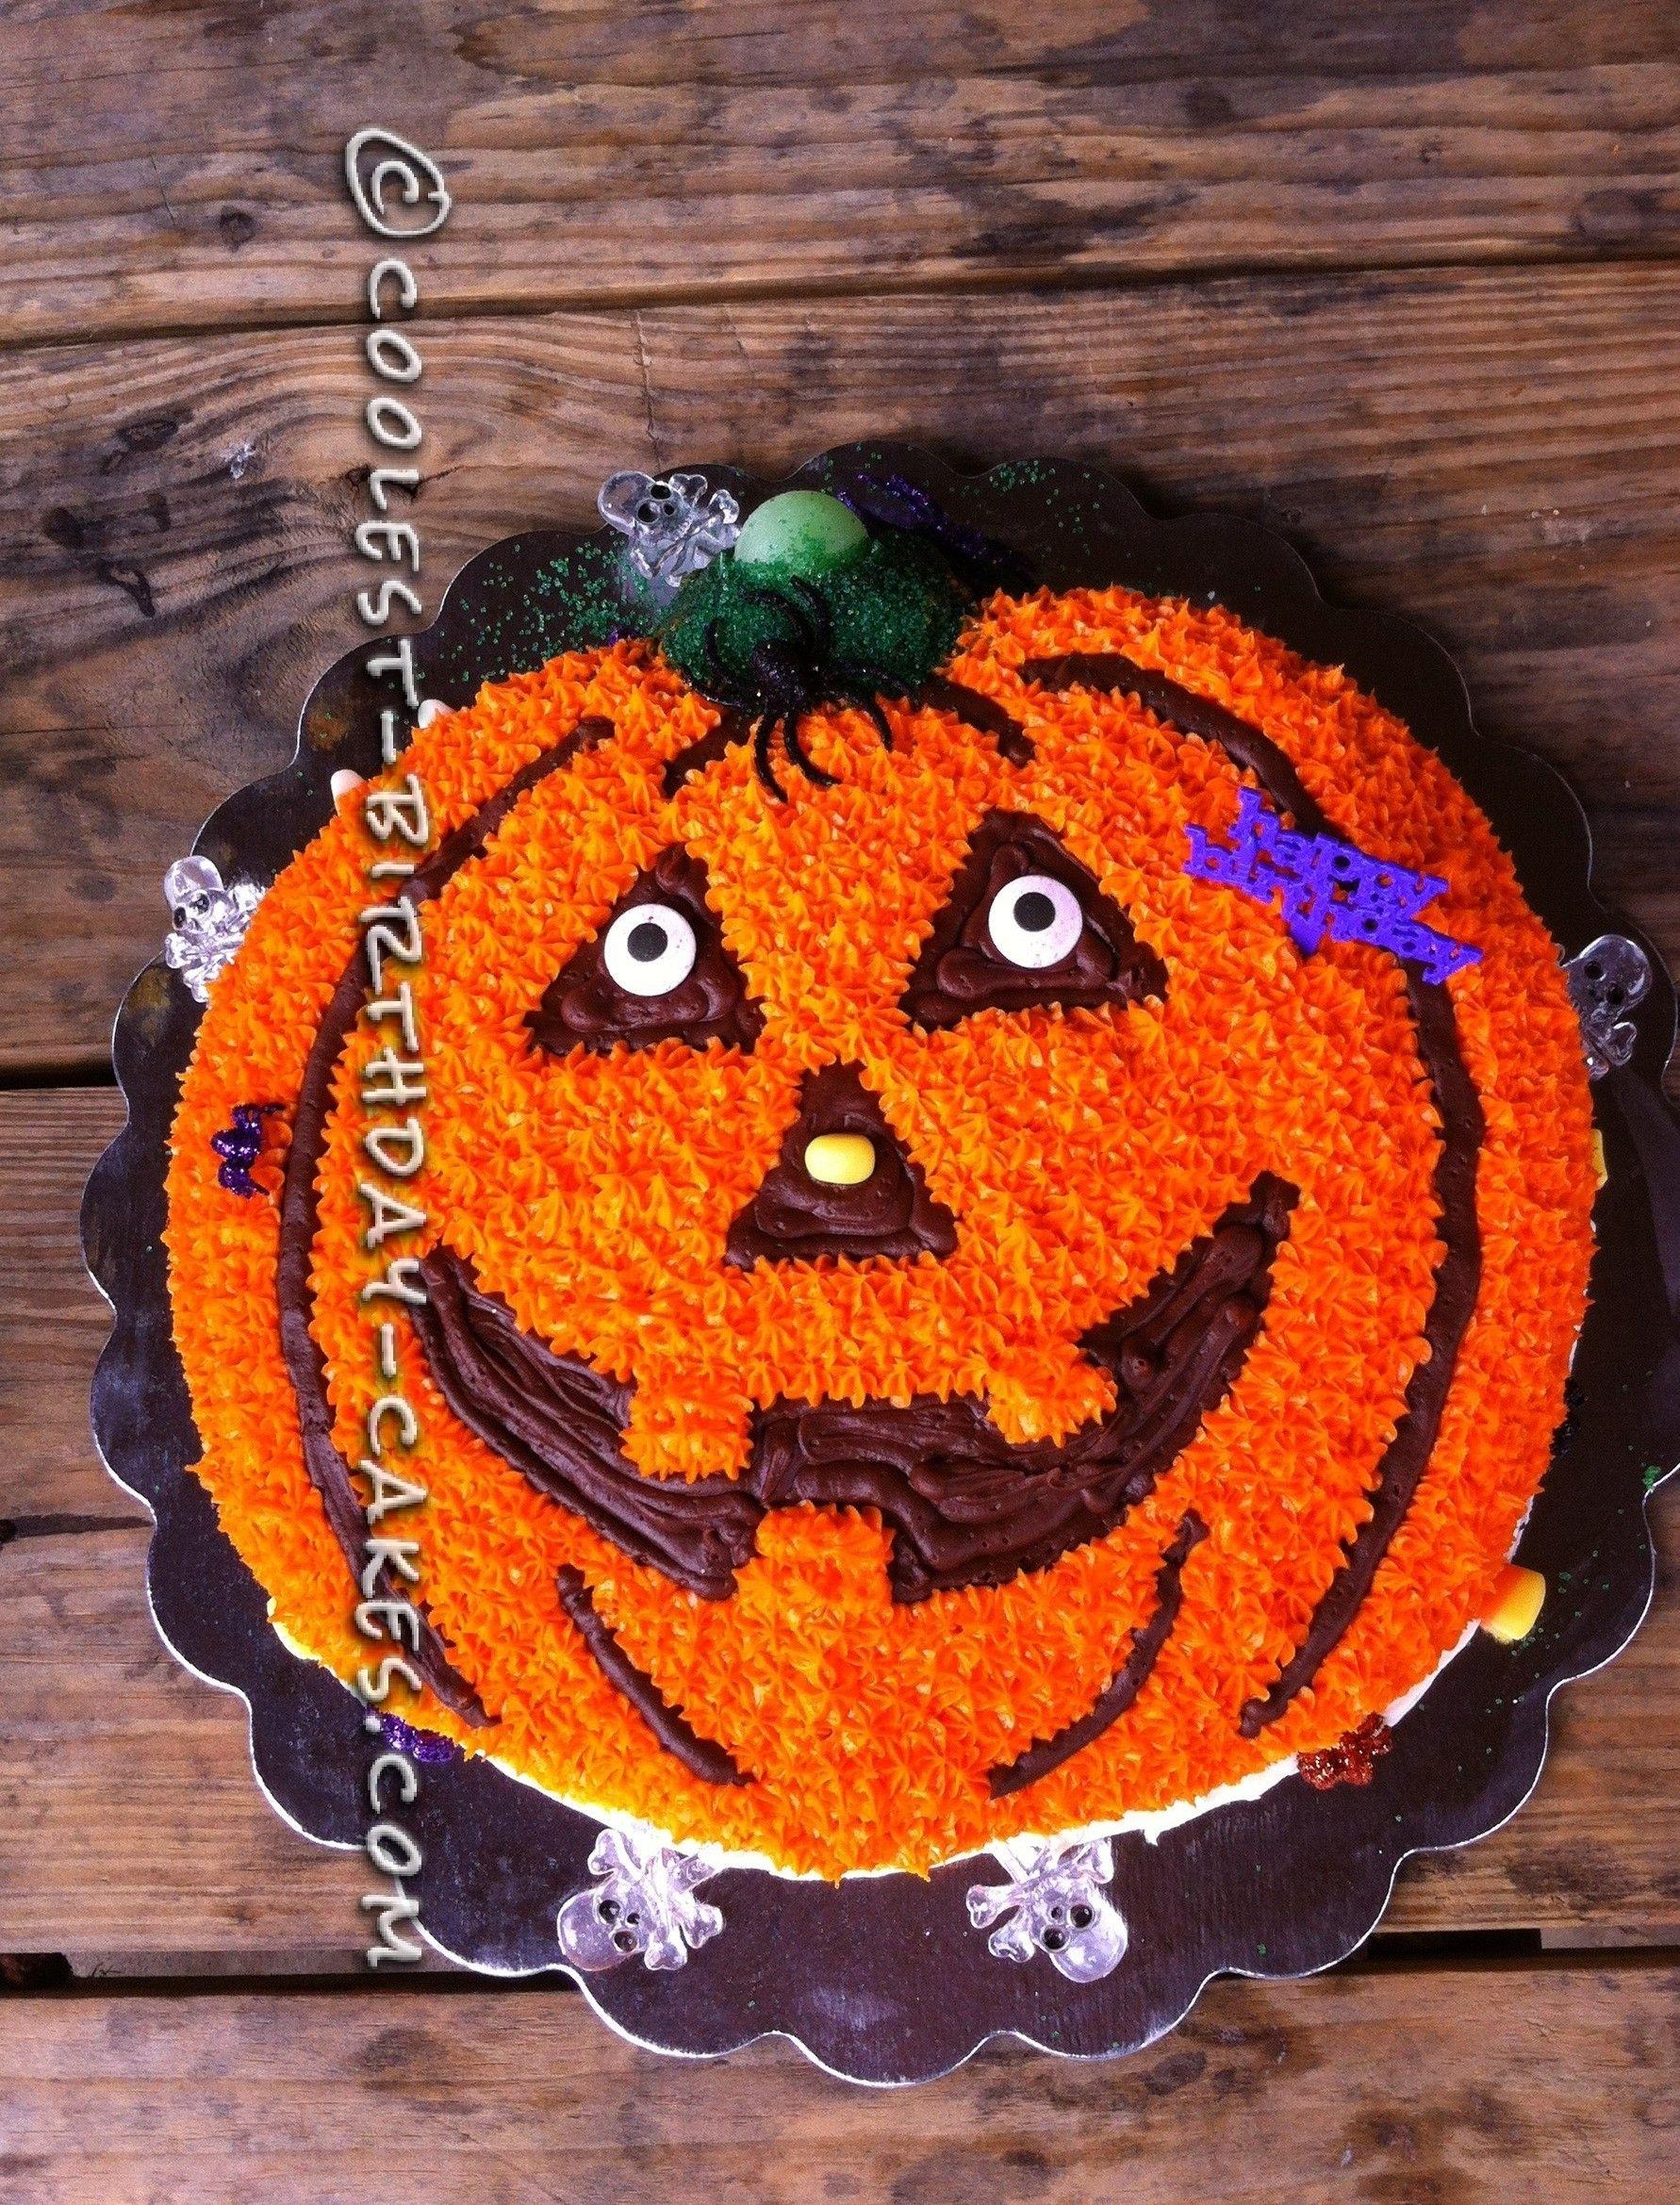 Pumpkin Birthday Cake Using The Wilton Pumpkin Cake Pan With